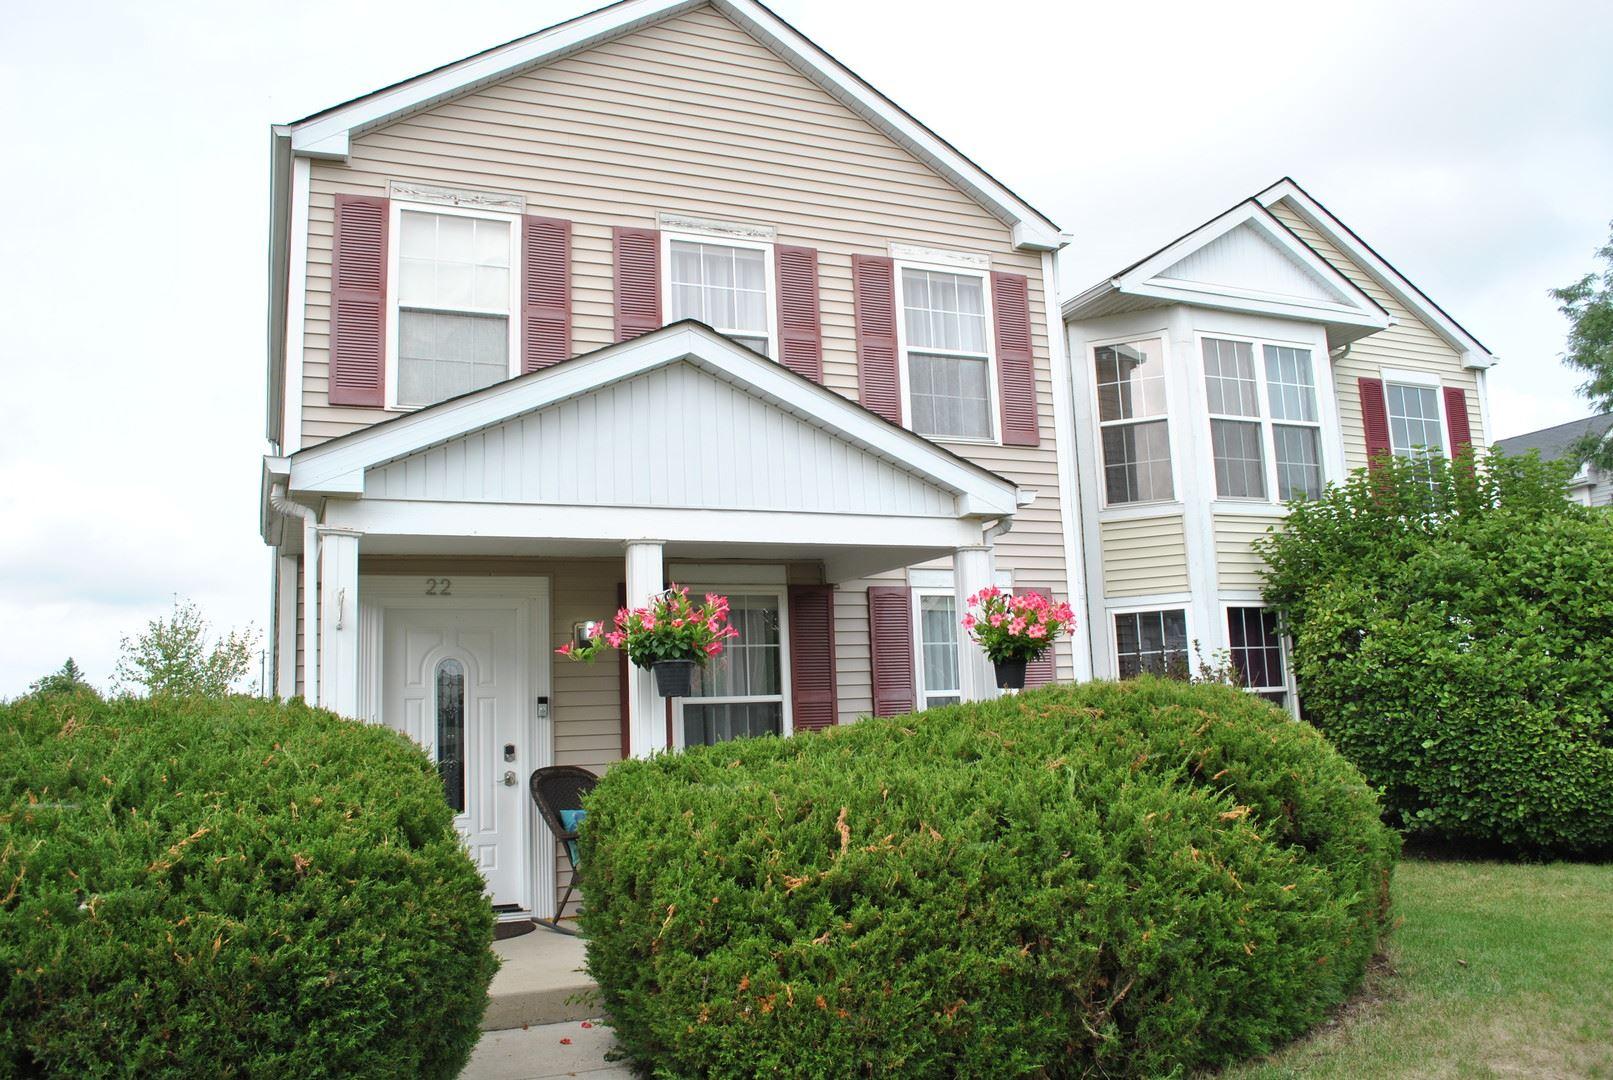 Photo of 22 Harmony Lane, Romeoville, IL 60446 (MLS # 10882254)